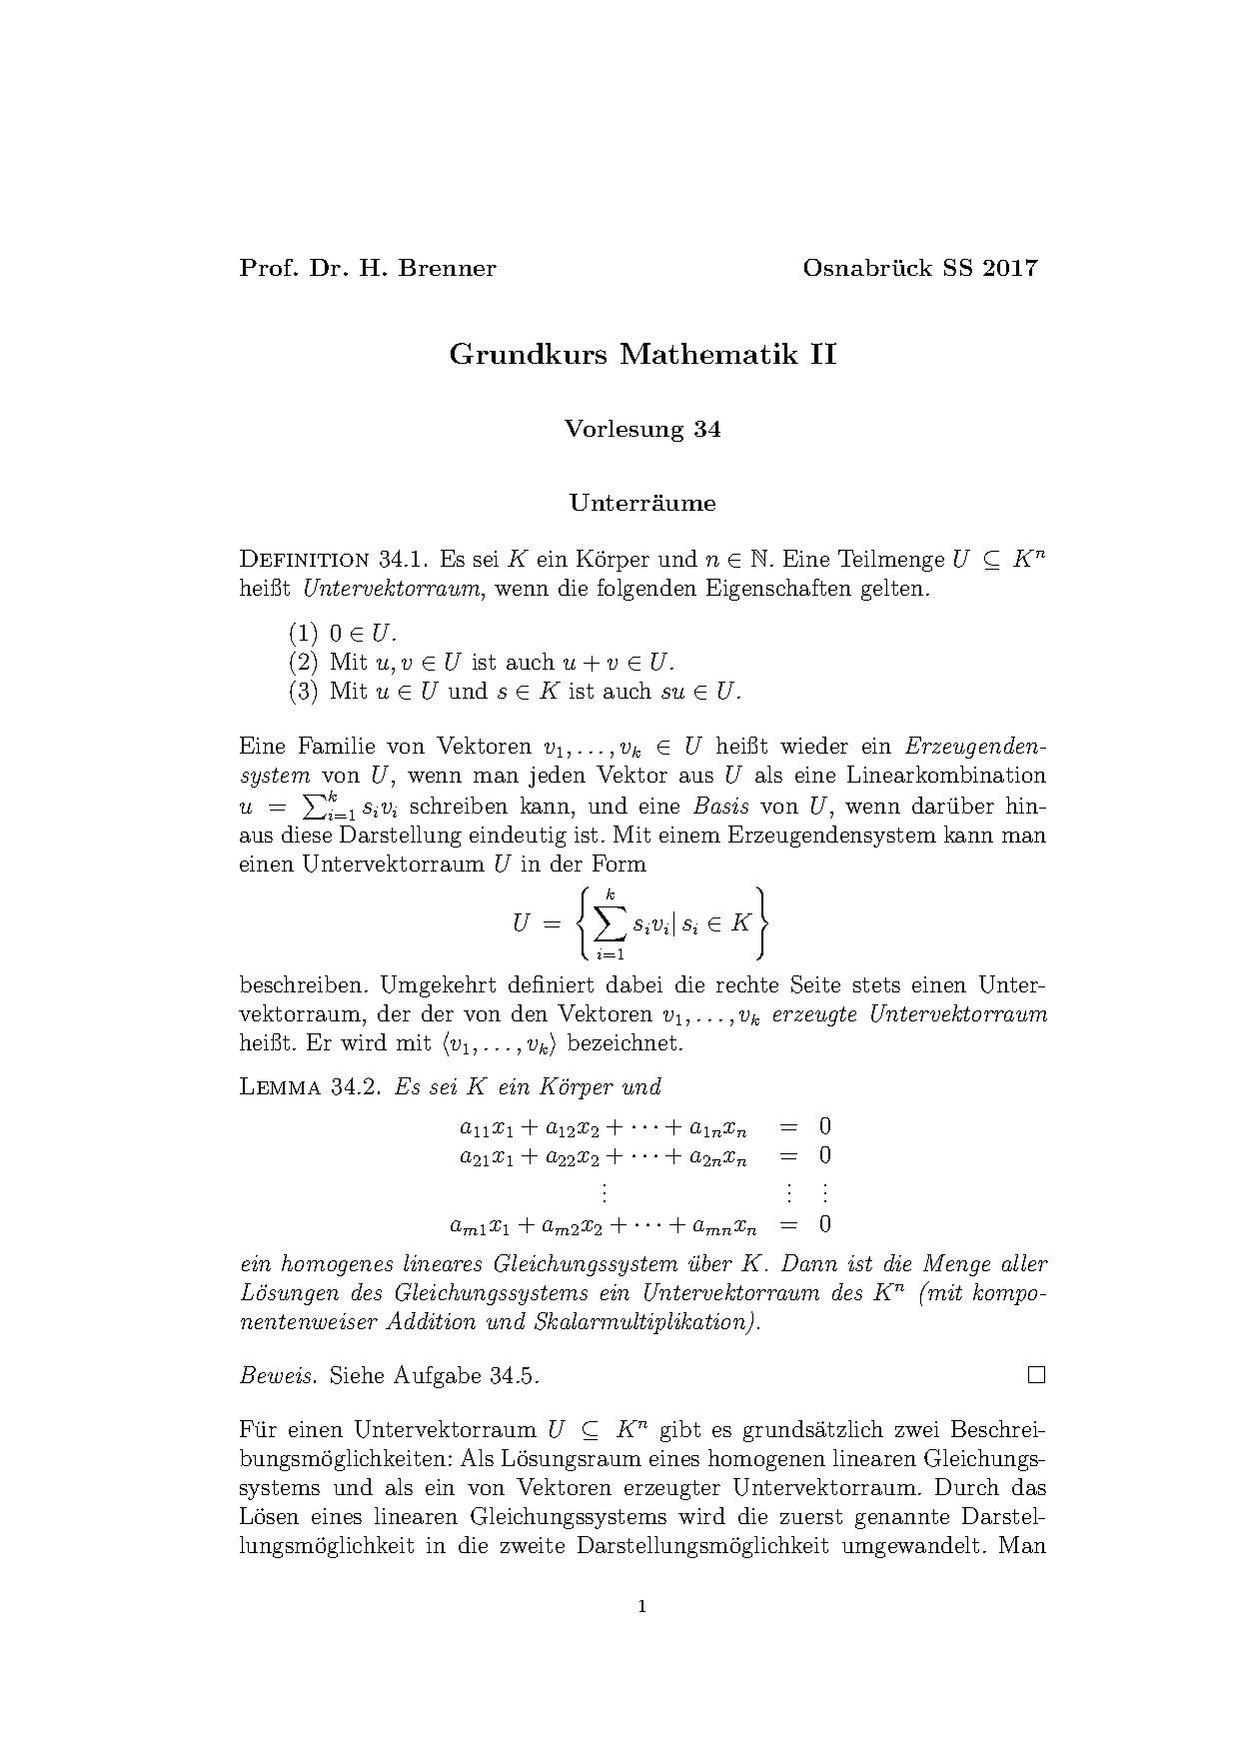 File:Grundkurs Mathematik (Osnabrück 2016-2017)Teil IIVorlesung34 ...